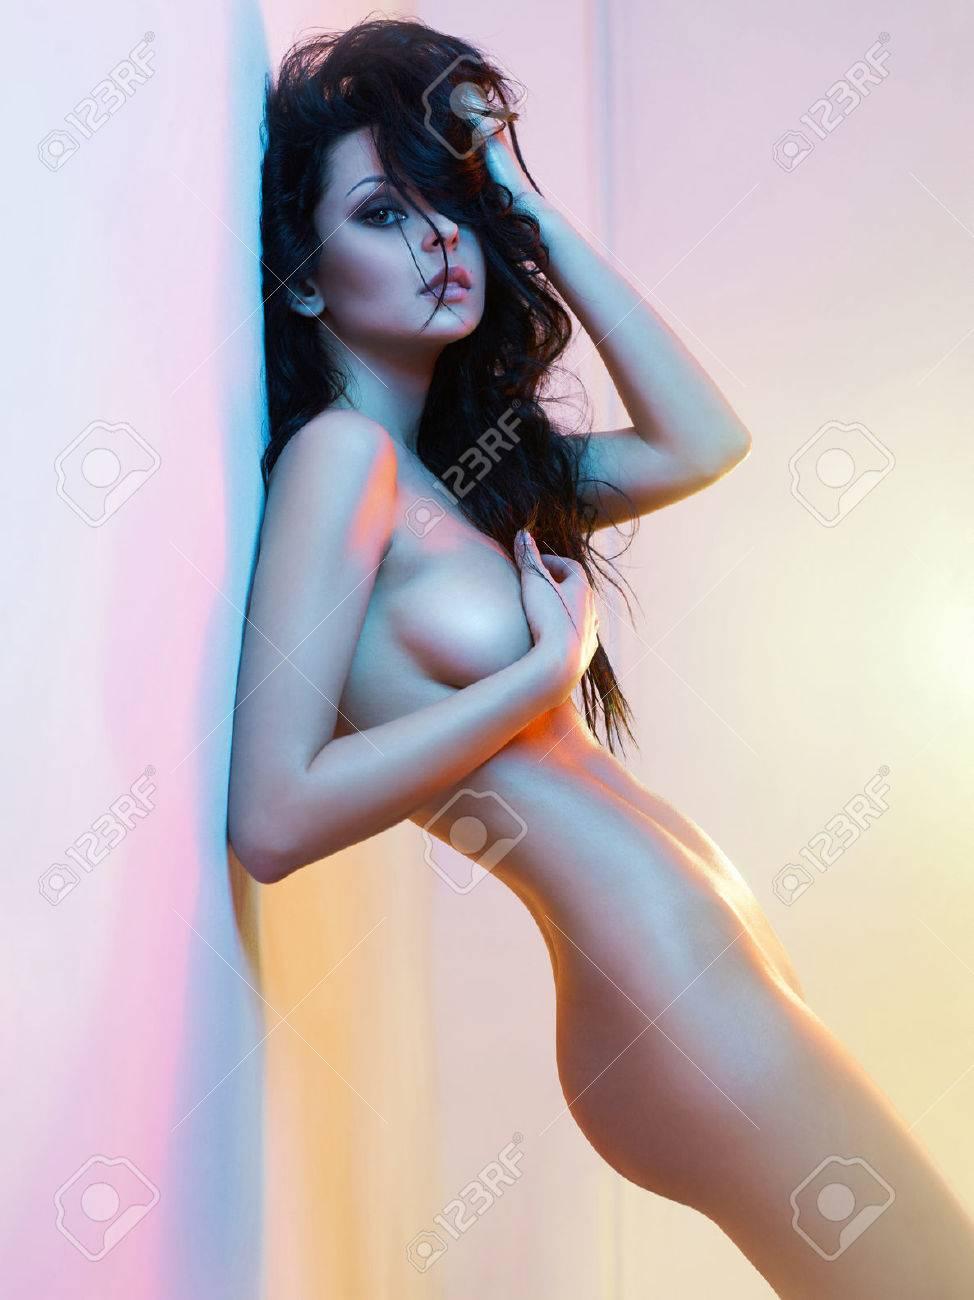 Elegant nude woman